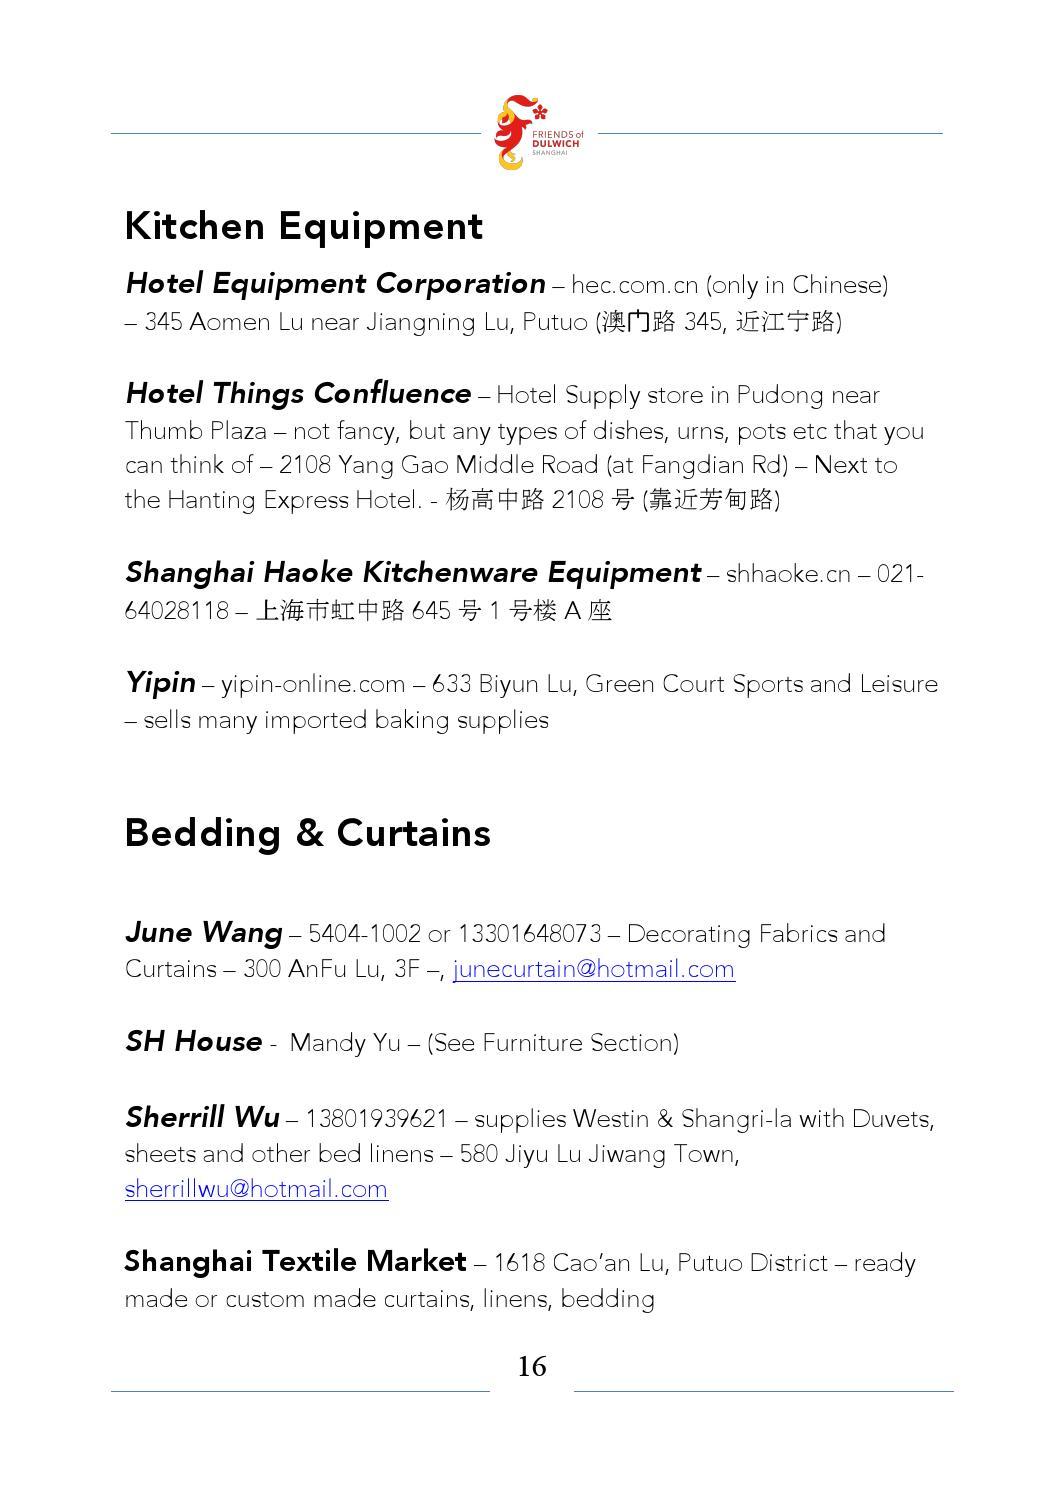 Shanghai Secrets 2015 by Dulwich College Shanghai - issuu